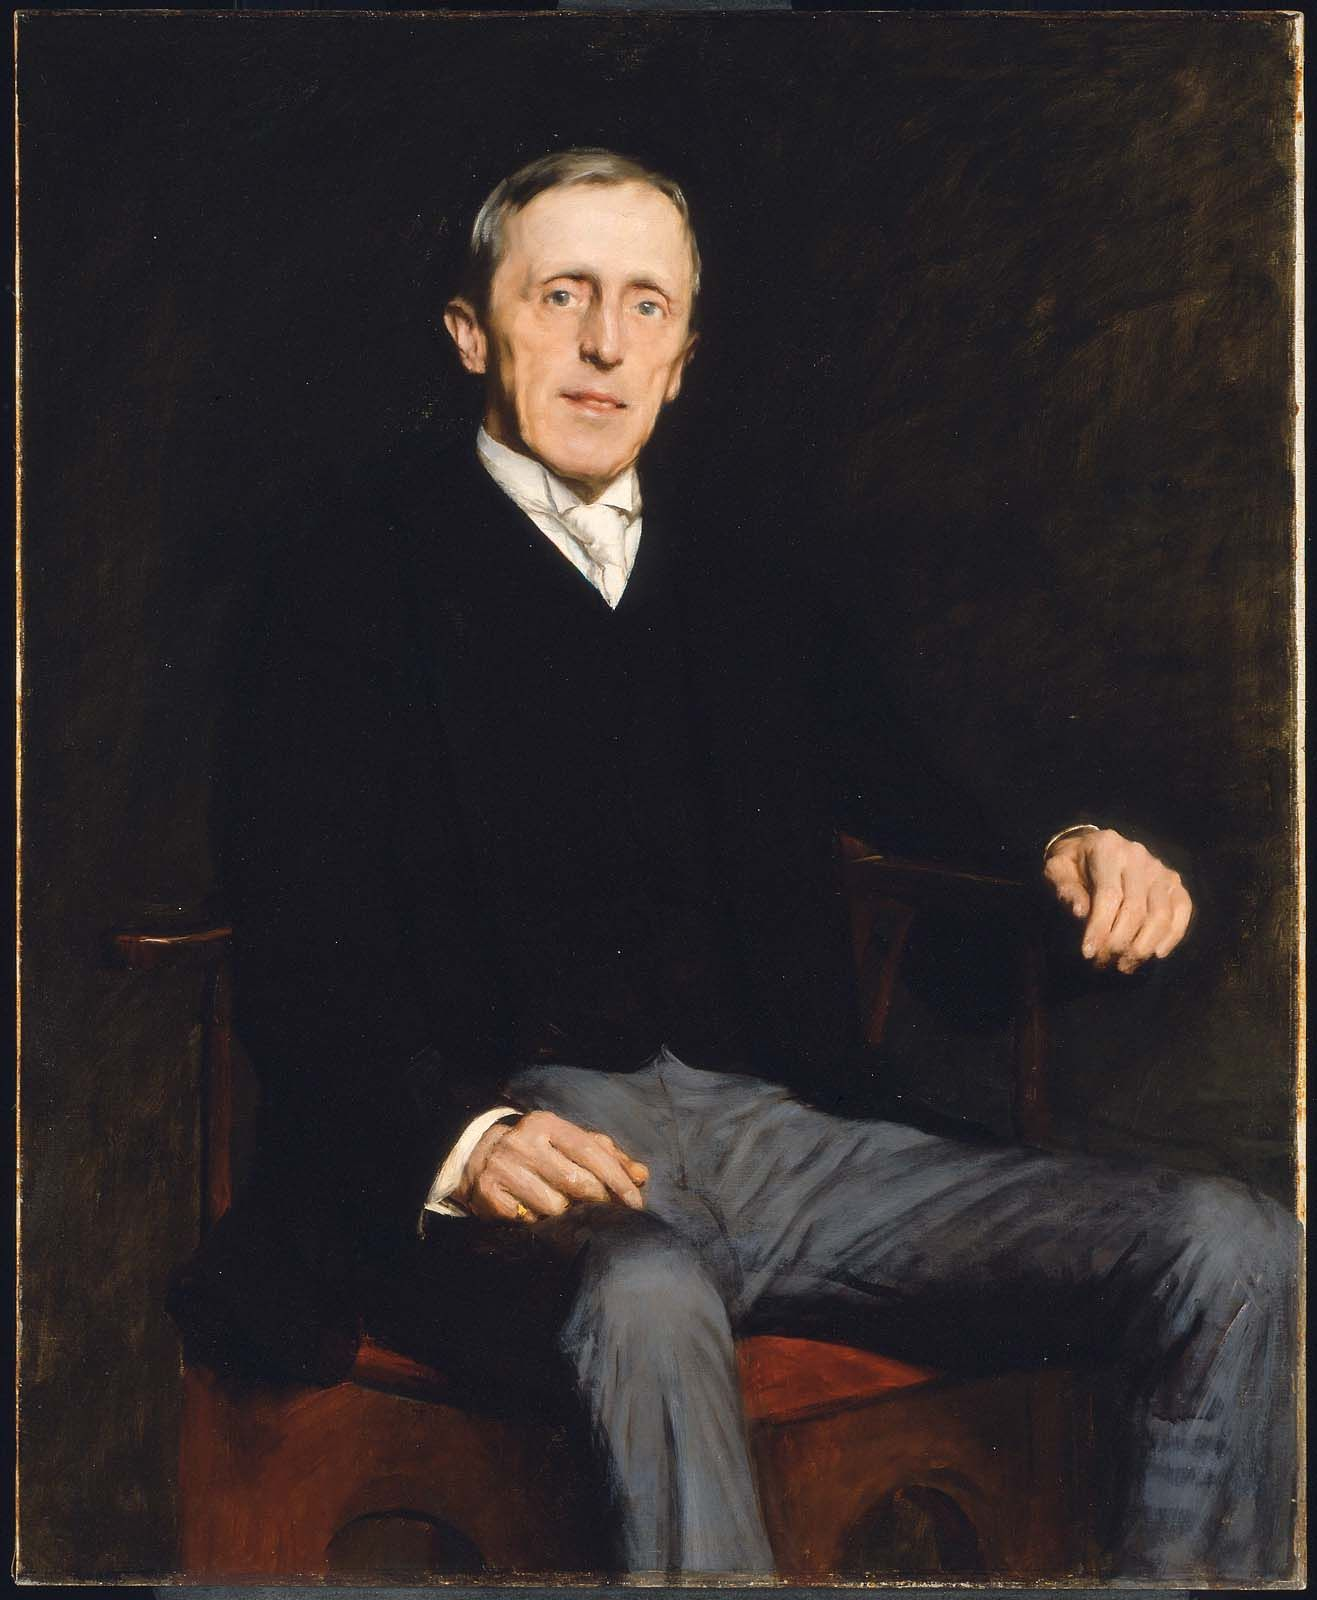 """George Augustus Gardner,"" Dennis Miller Bunker, 1888, oil on canvas, 44 x 36"", Museum of Fine Arts, Boston."